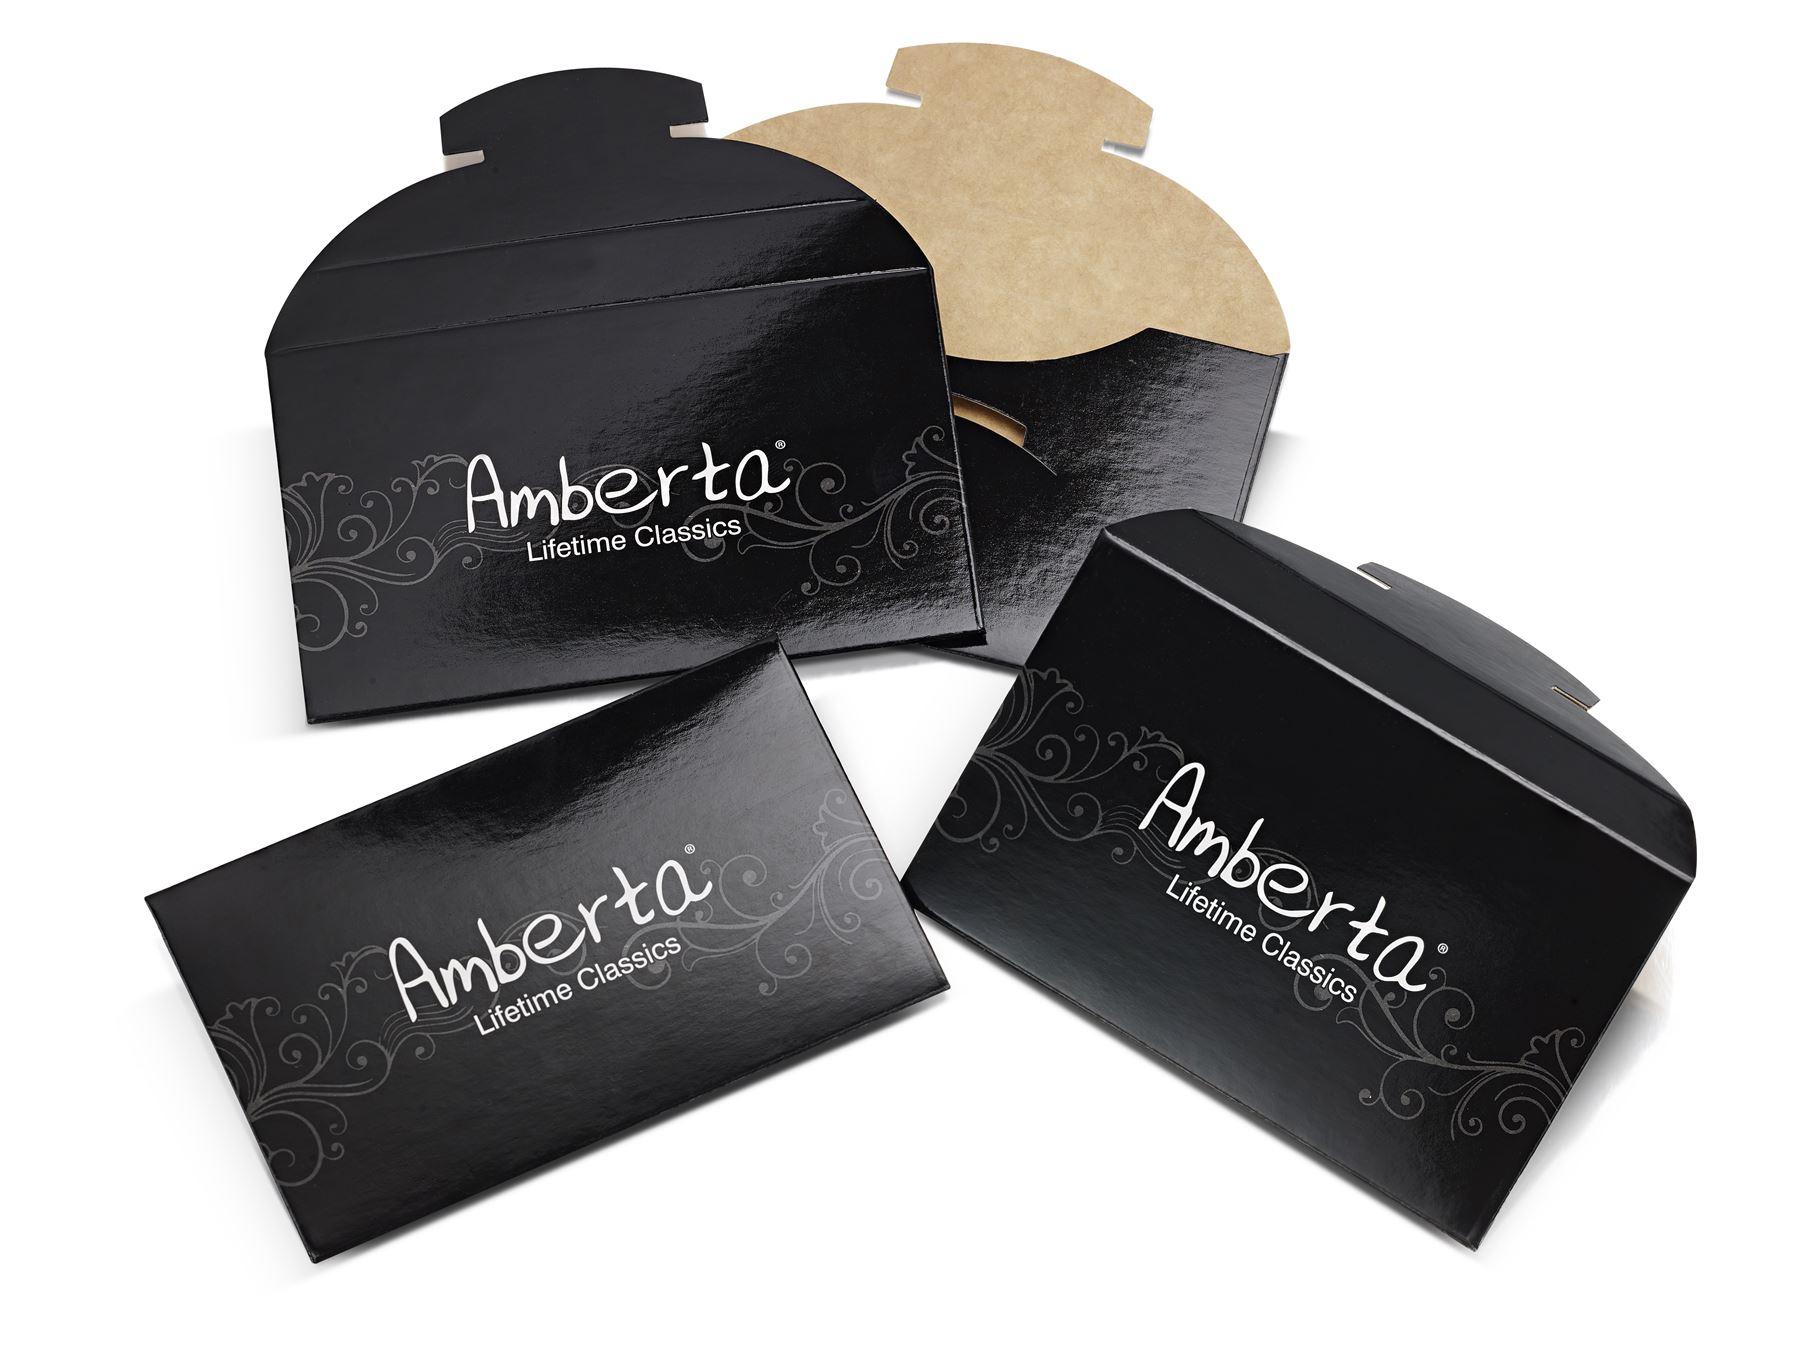 Amberta-Jewelry-925-Sterling-Silver-Adjustable-Bracelet-Italian-Bangle-for-Women thumbnail 7